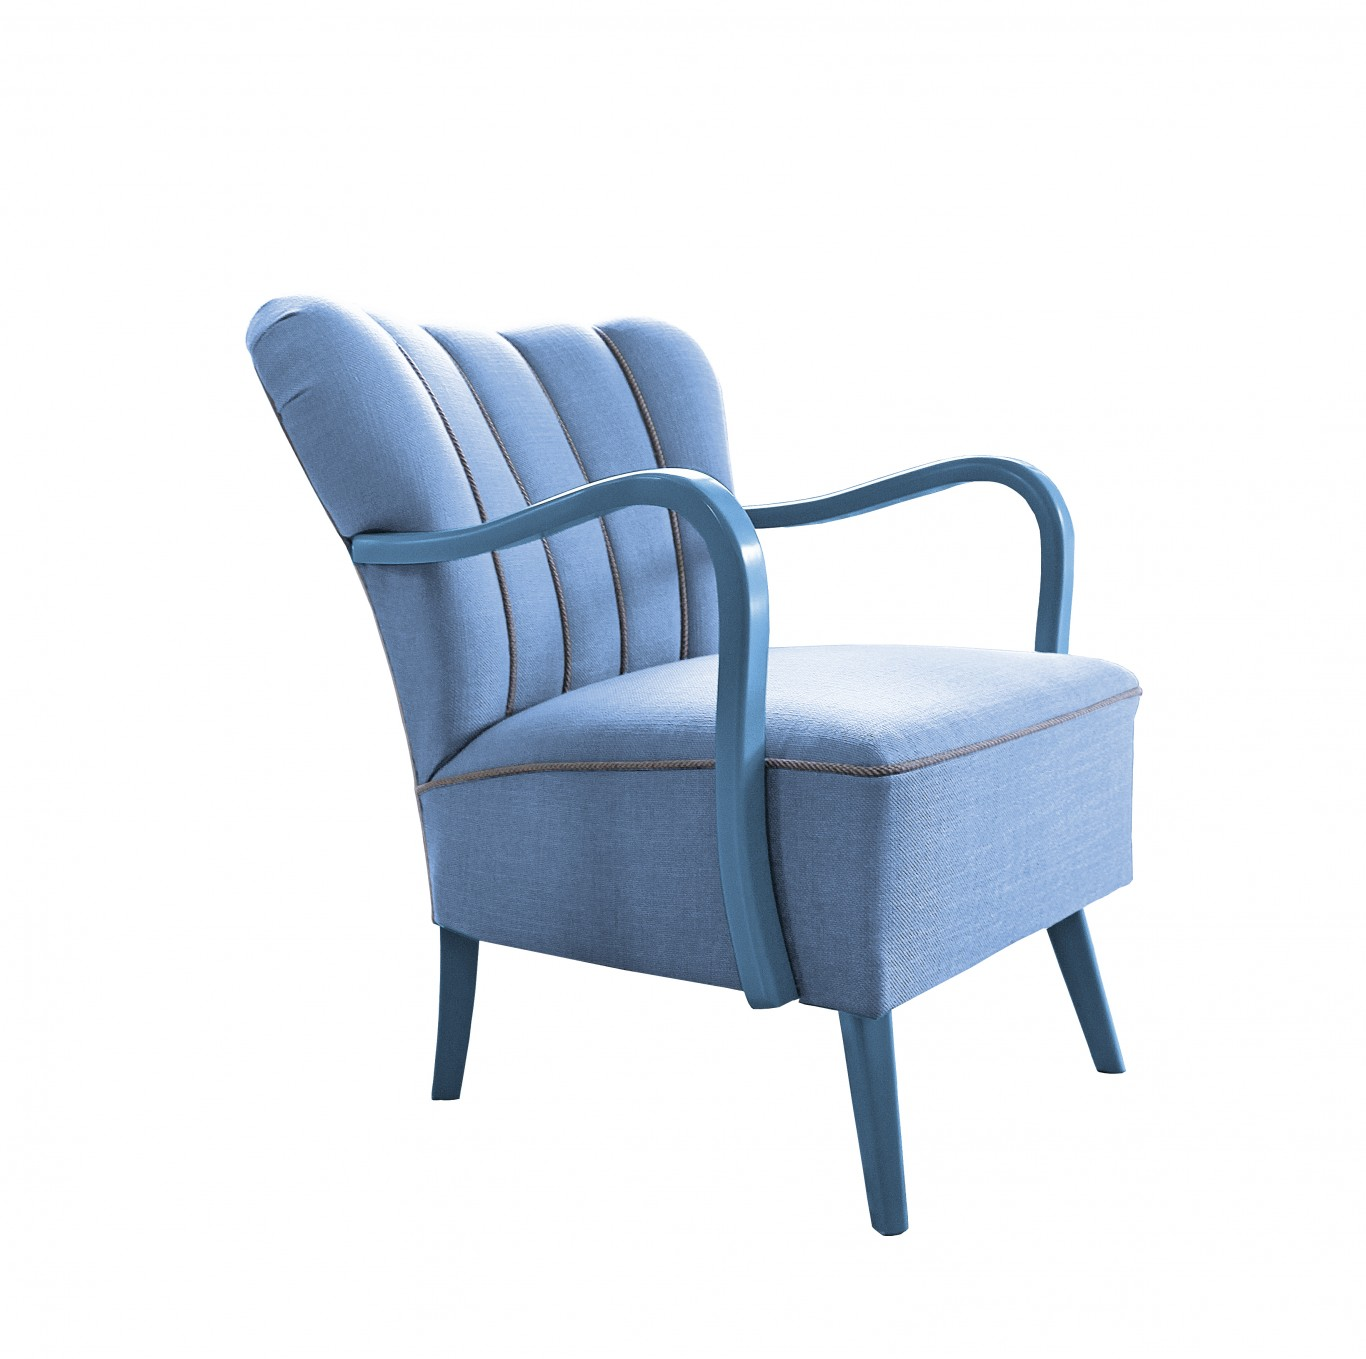 Piu armchair